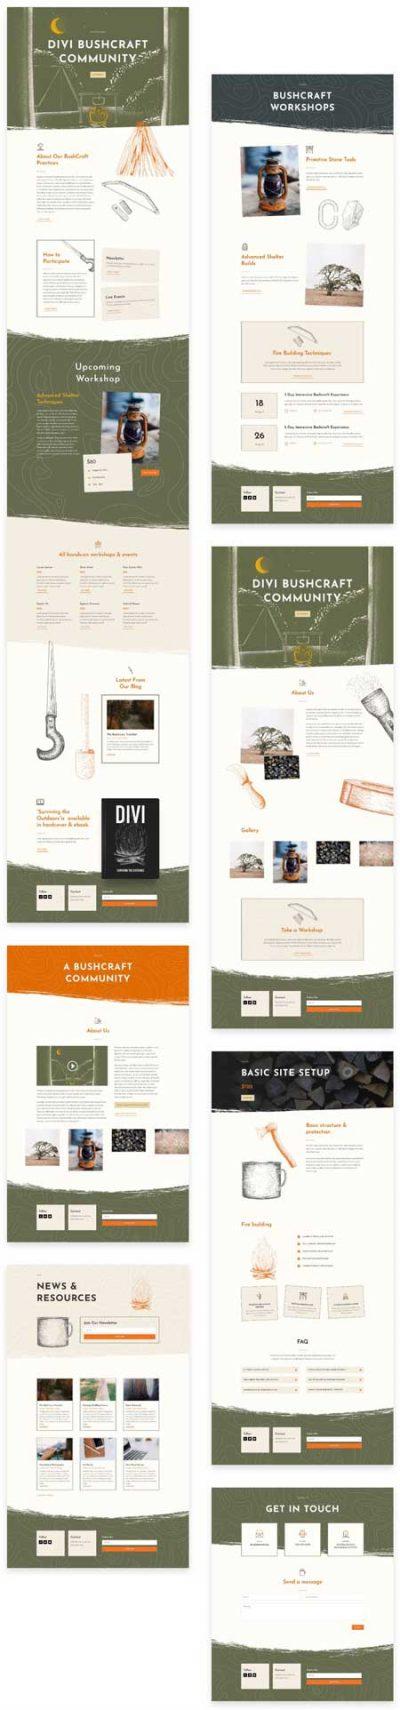 Divi Bush craft Layout Pack